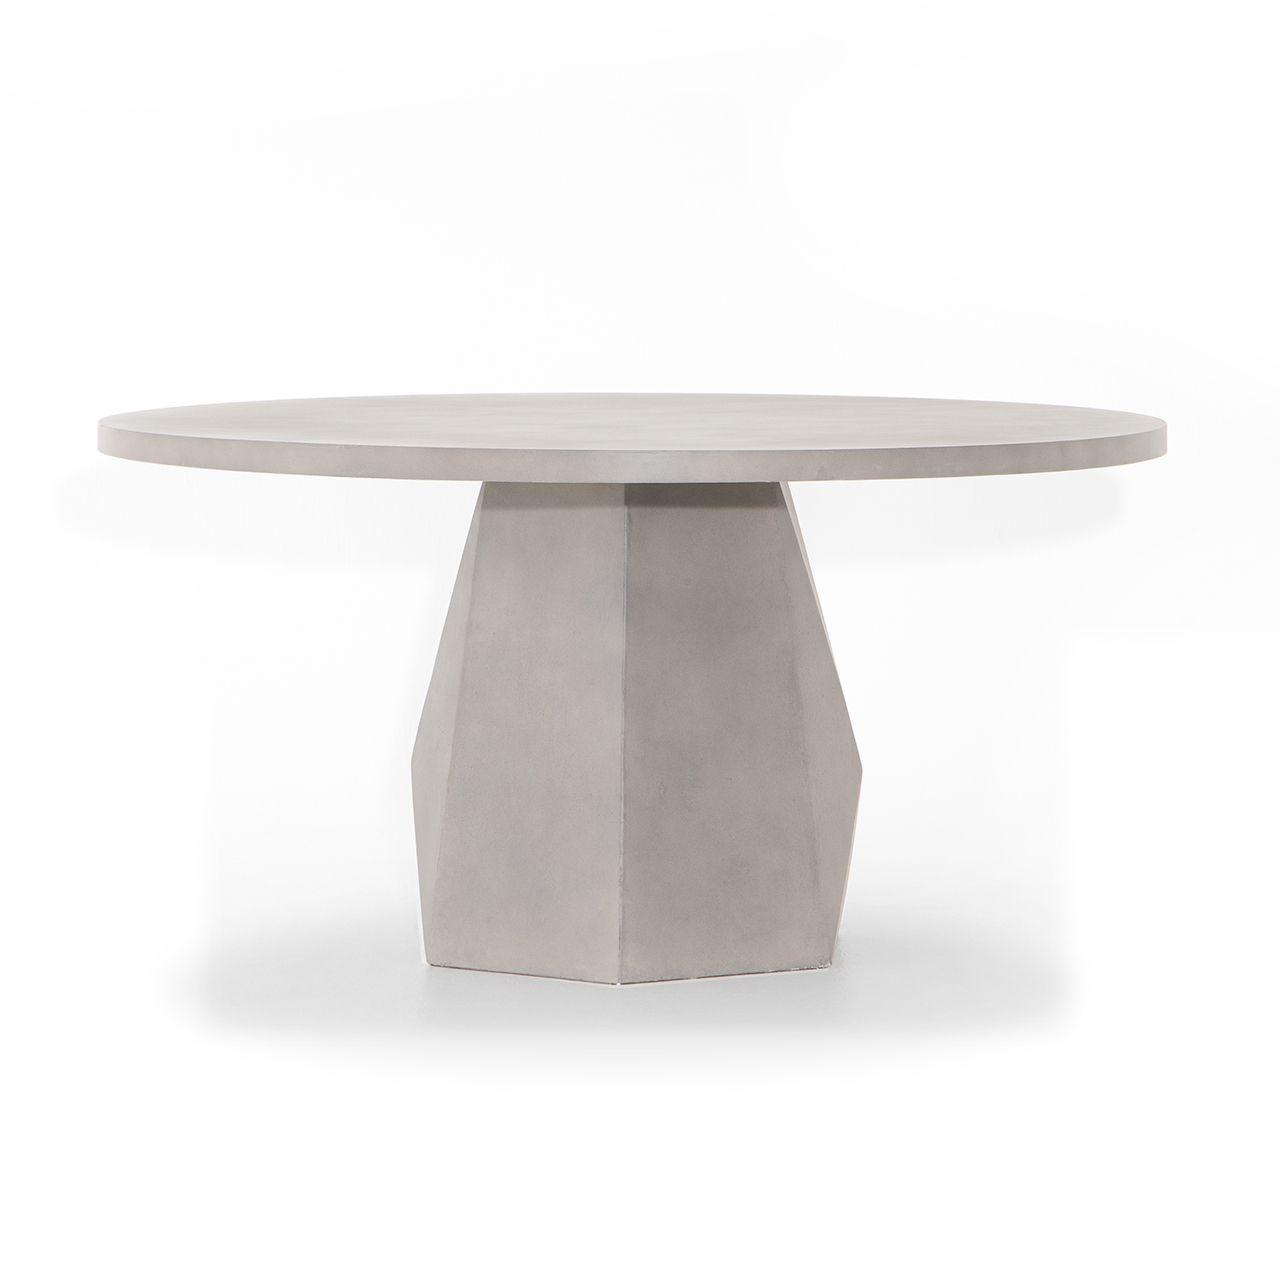 Laguna Concrete Outdoor Round Dining Table Modern Outdoor Dining Table Round Outdoor Dining Table Round Dining [ 1280 x 1280 Pixel ]